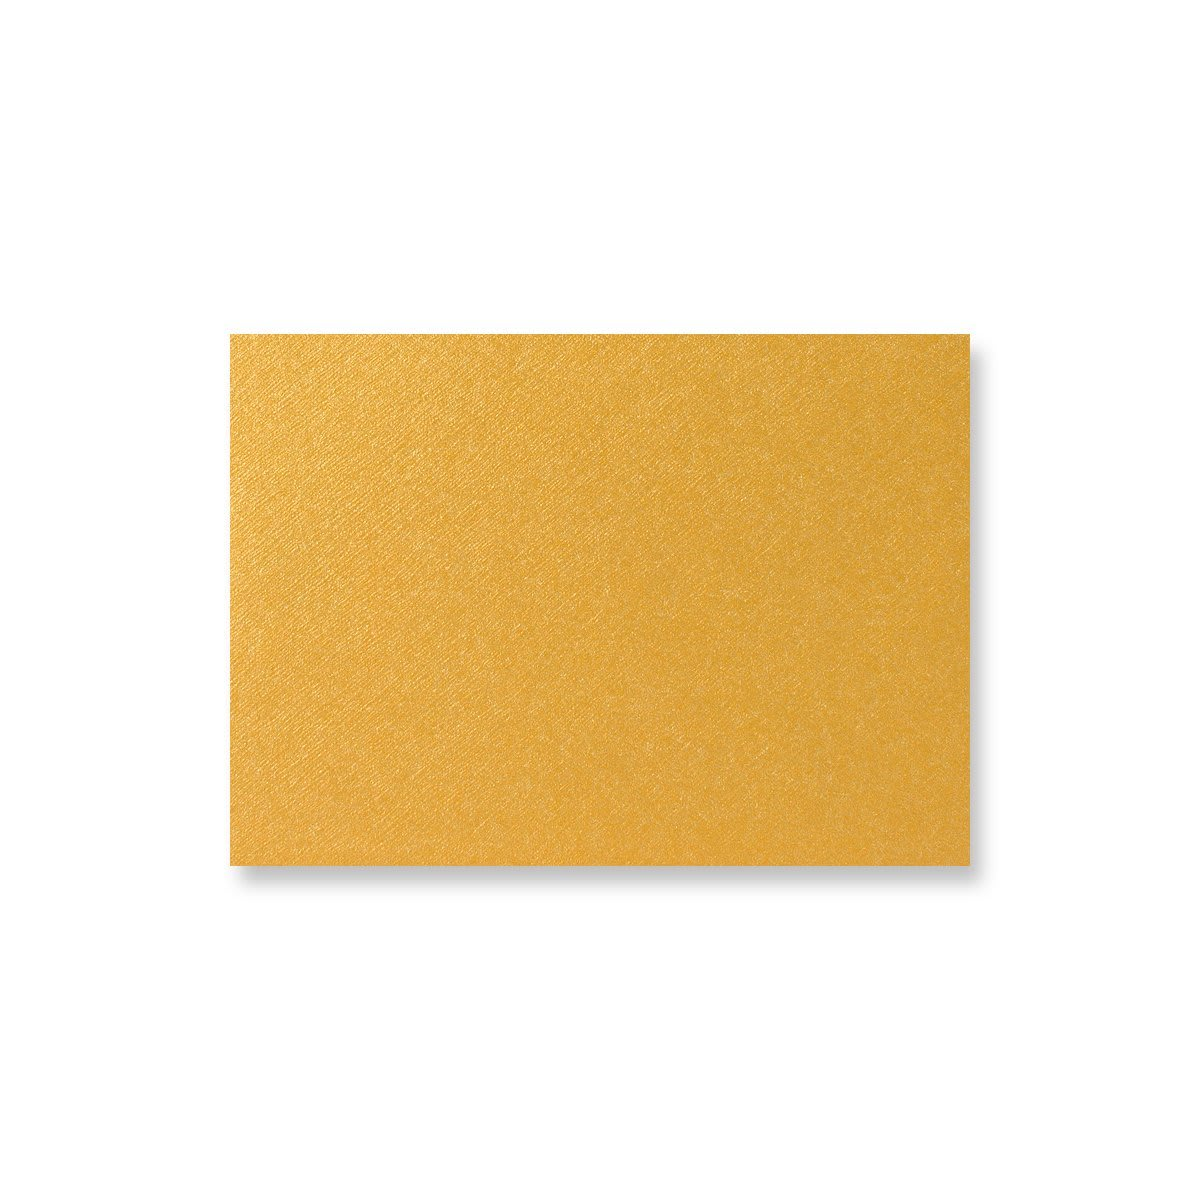 C7 GOLD BUTTERFLY ENVELOPES